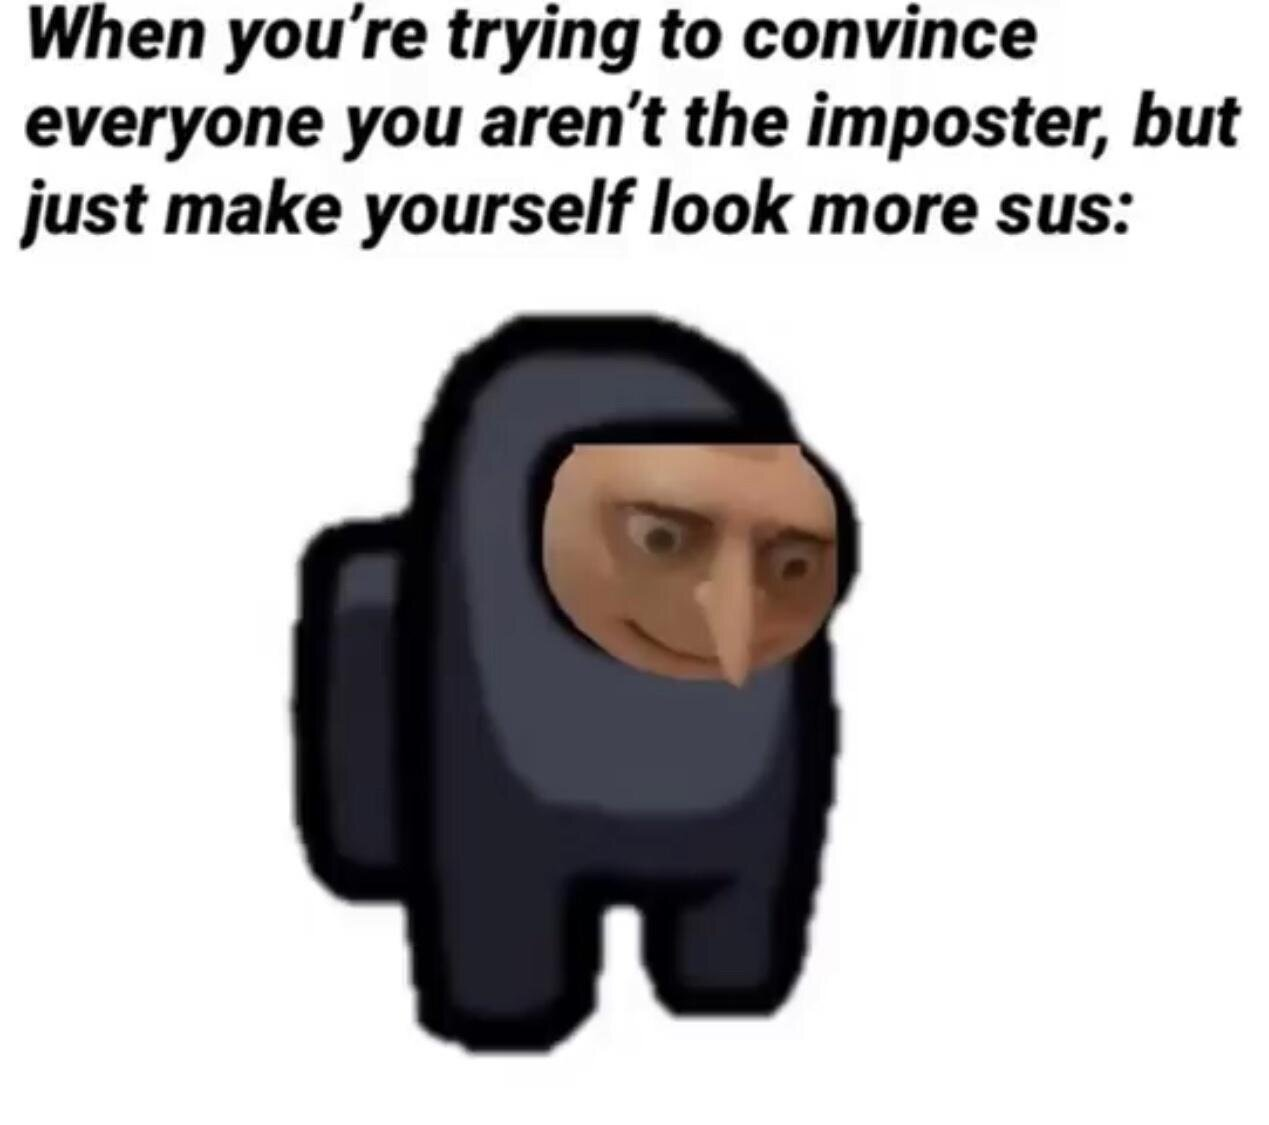 sussy wussy - meme